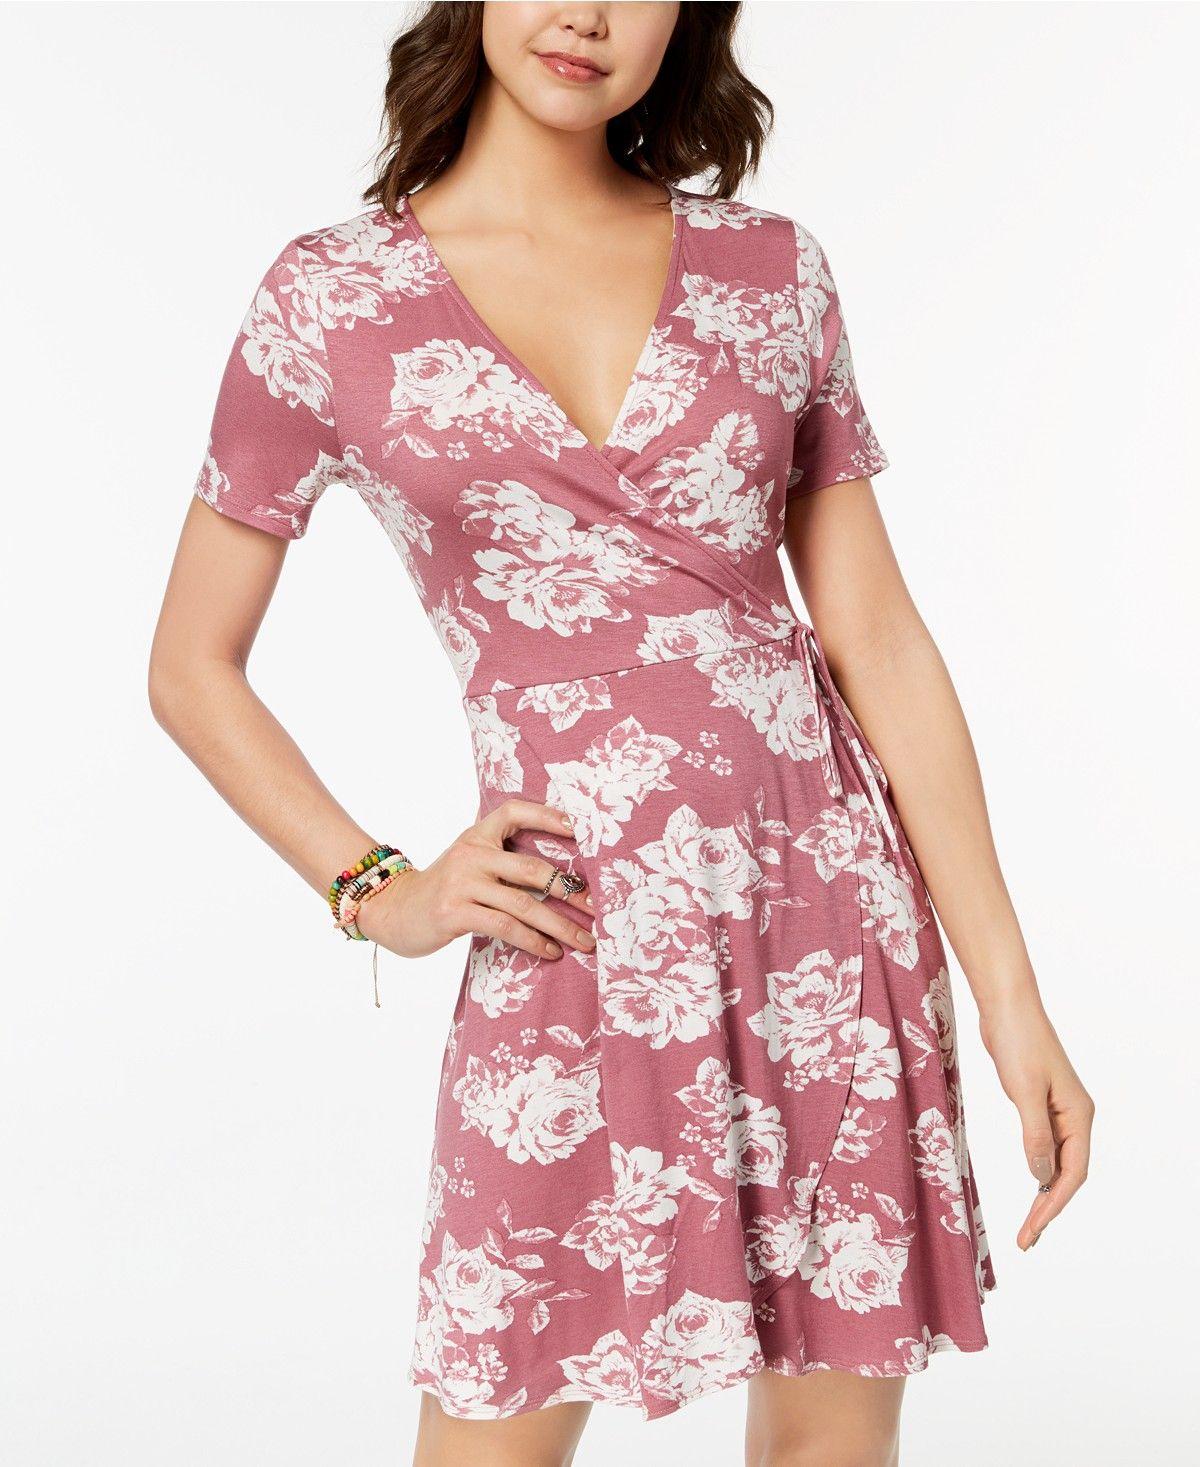 One Clothing Juniors Side Tie Wrap Dress Juniors Dresses Macy S Dresses Casual Summer Dresses Elegant Dresses Long [ 1467 x 1200 Pixel ]